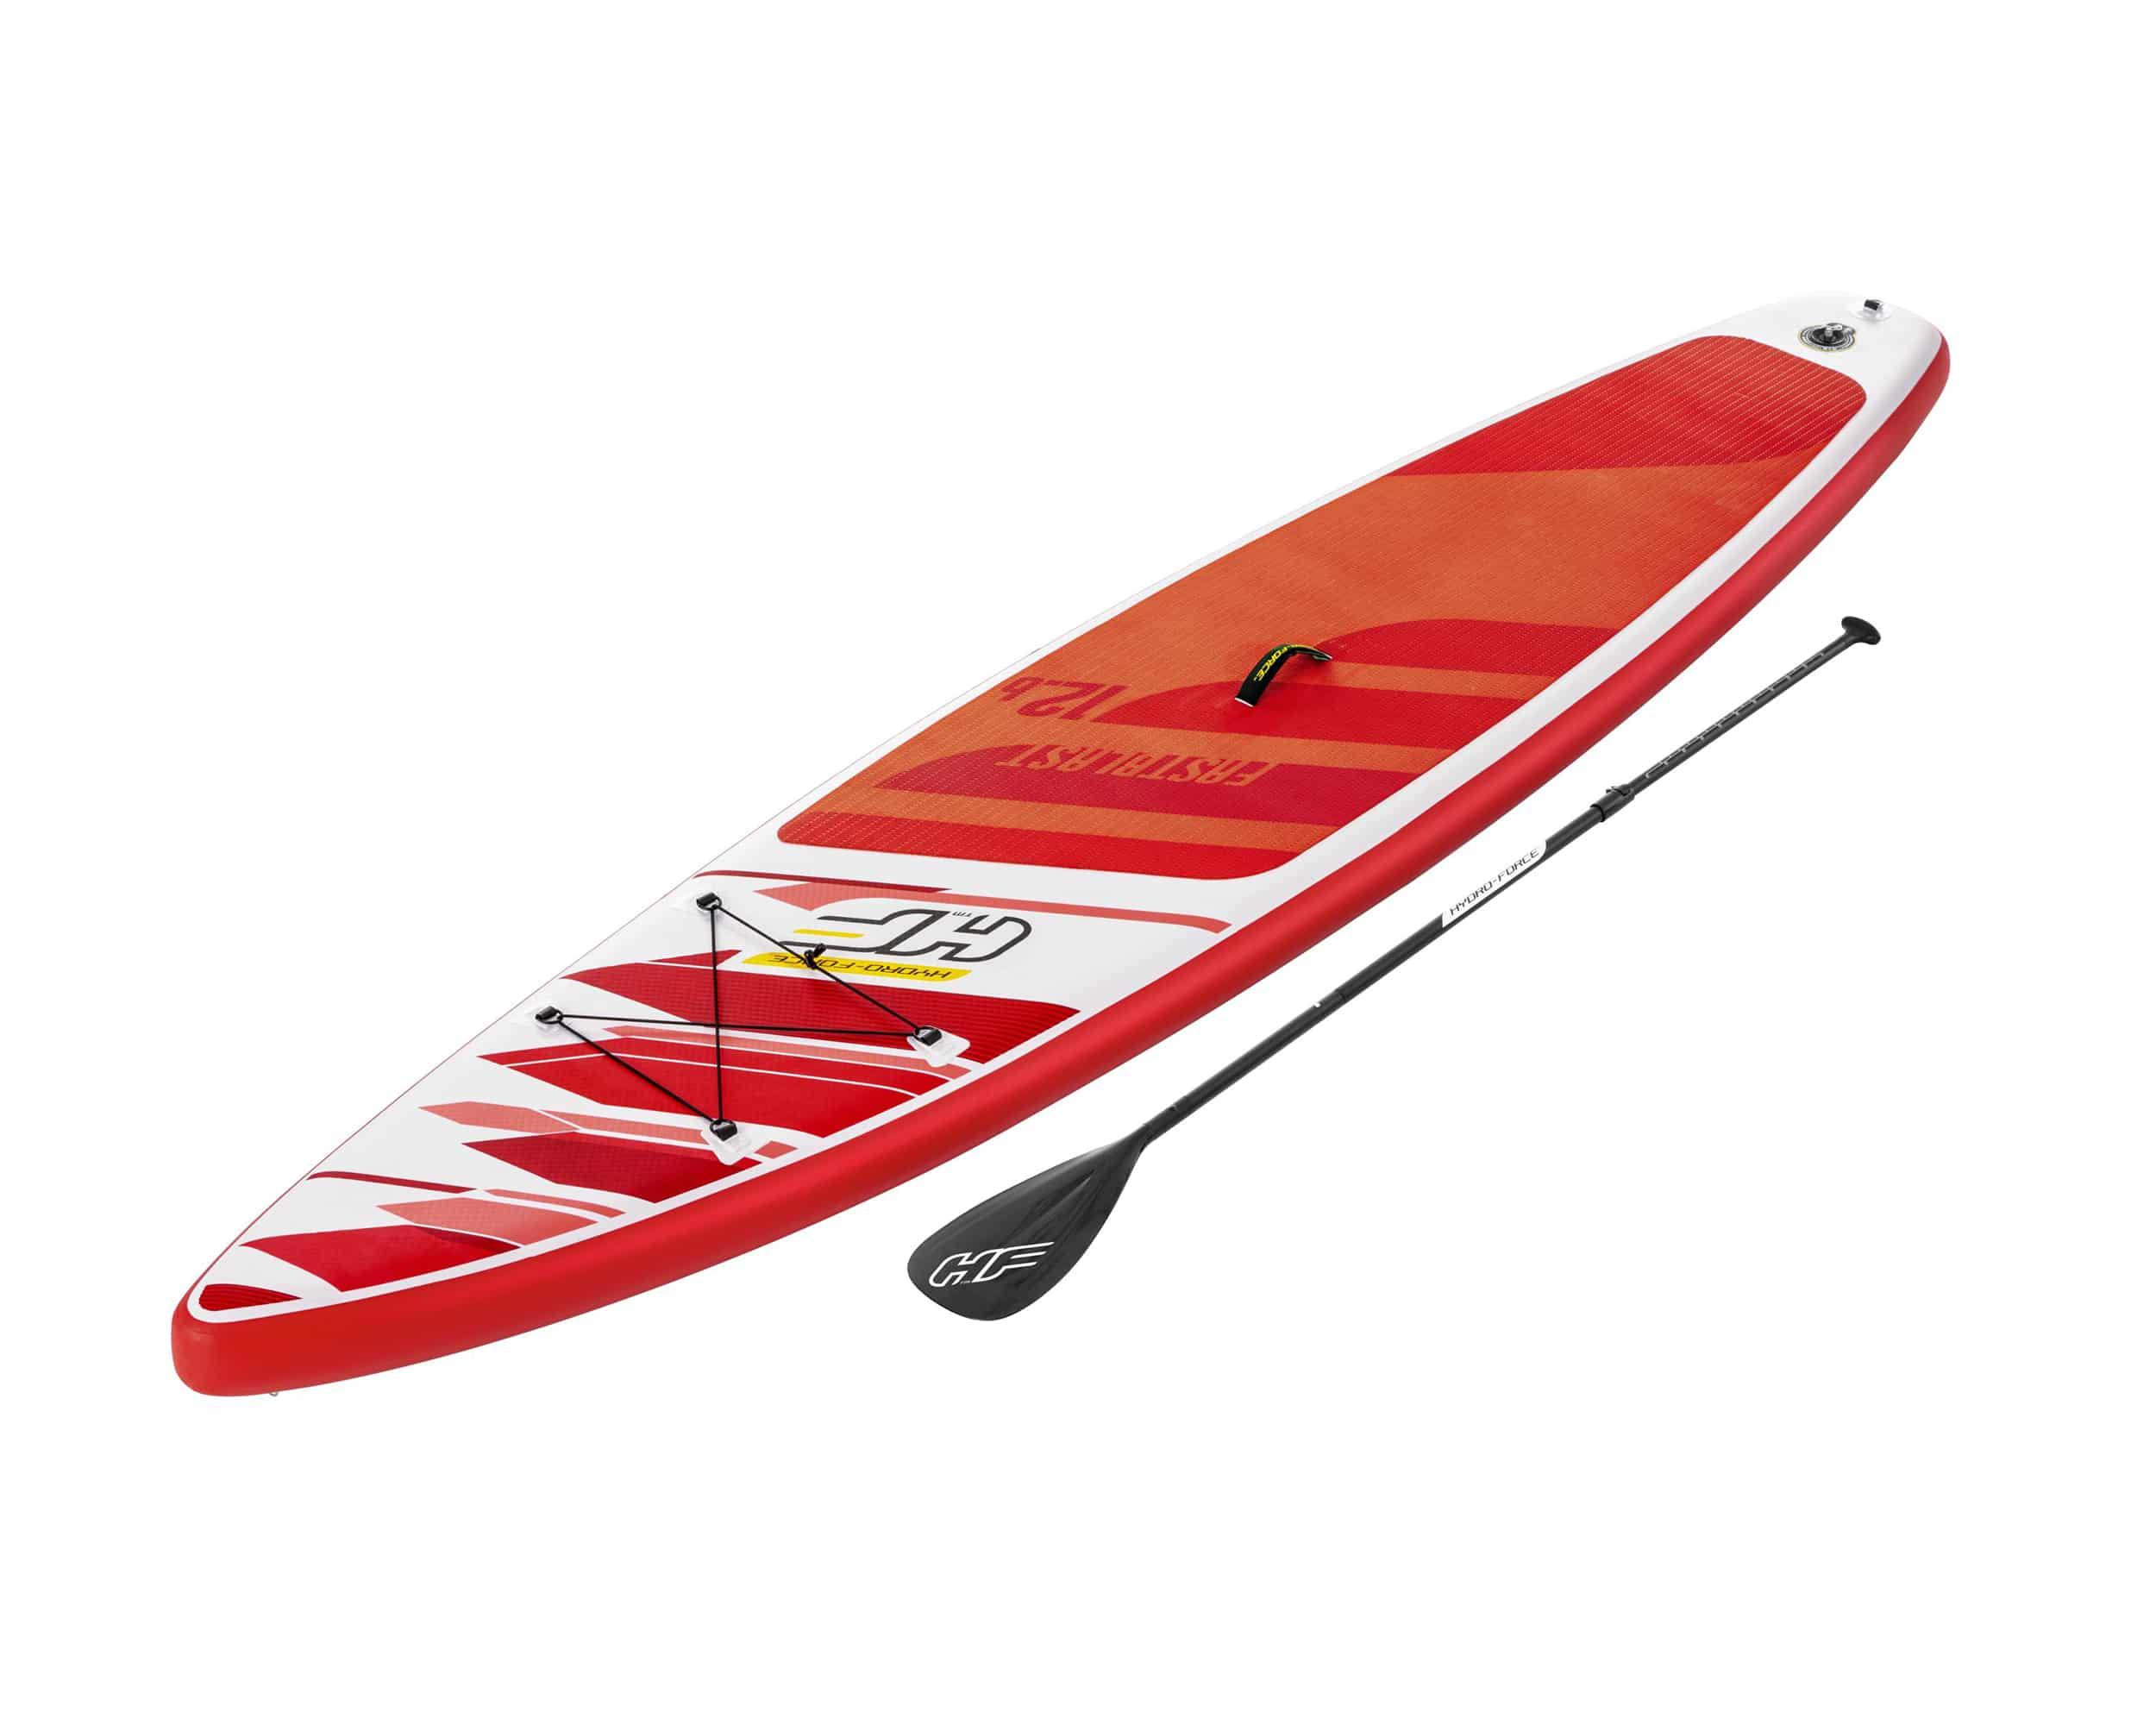 Hydro-Force Fastblast Tech Paddle Board